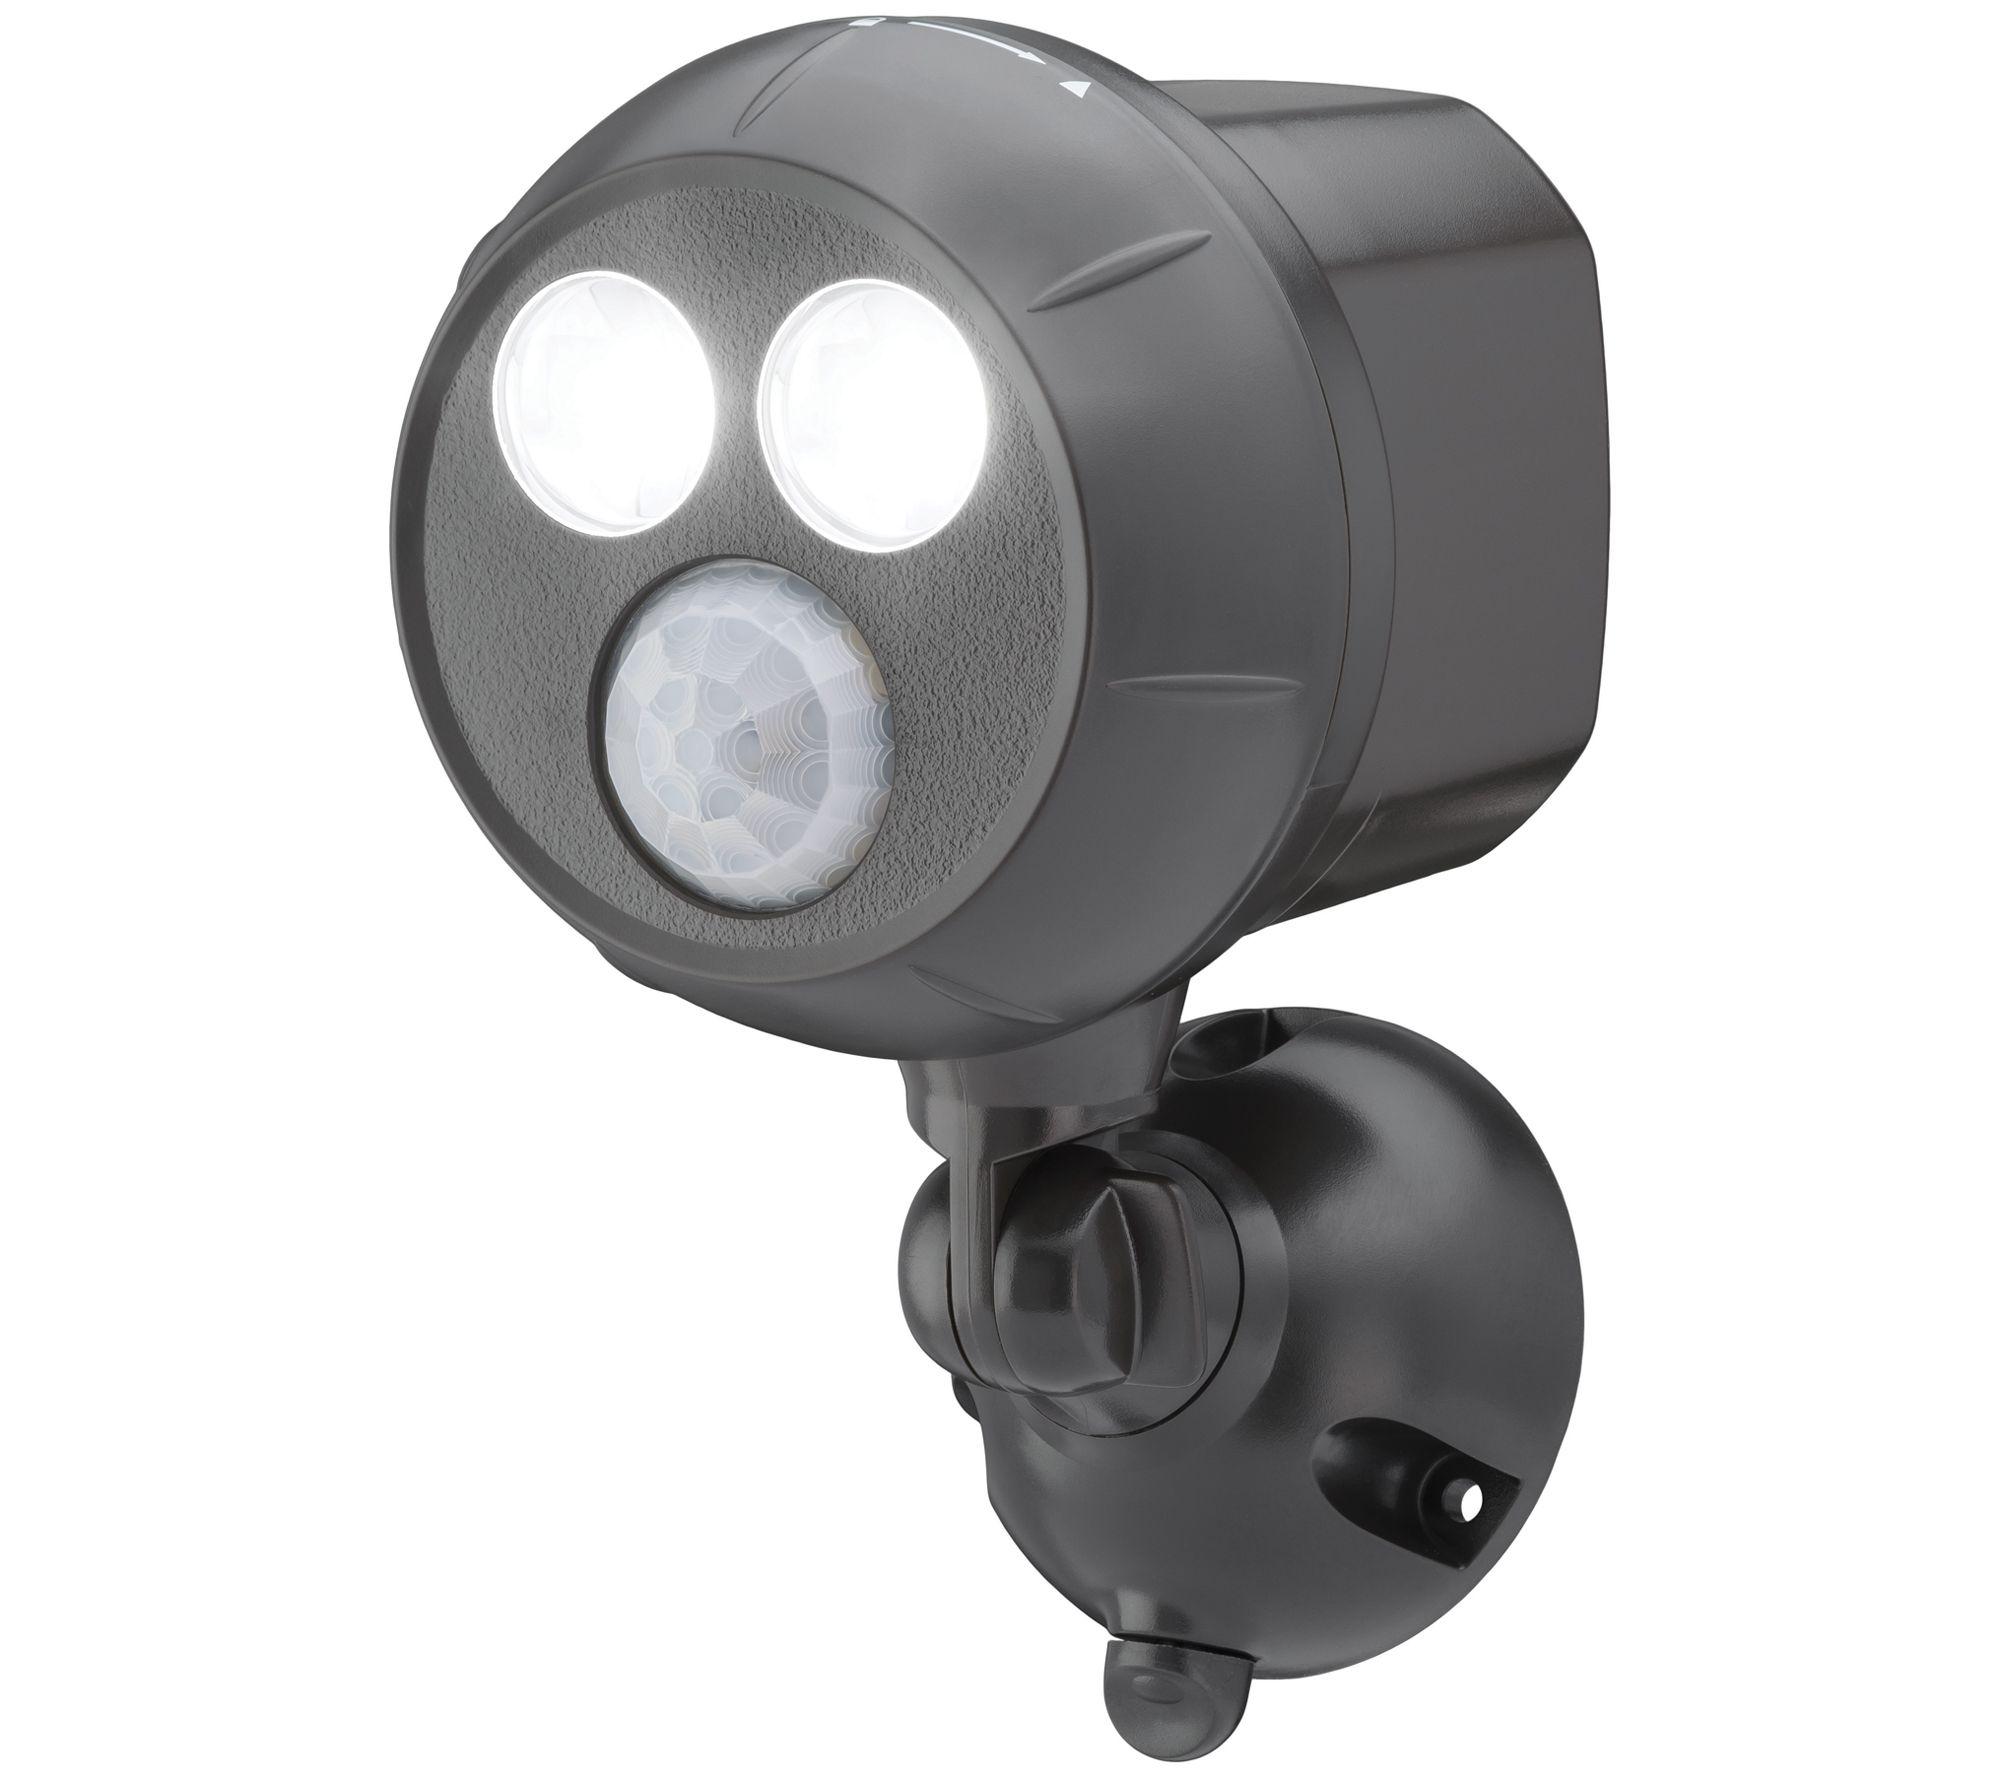 Mr Beams Mb390 400 Lumen Wireless Led Spotlight Qvc Com